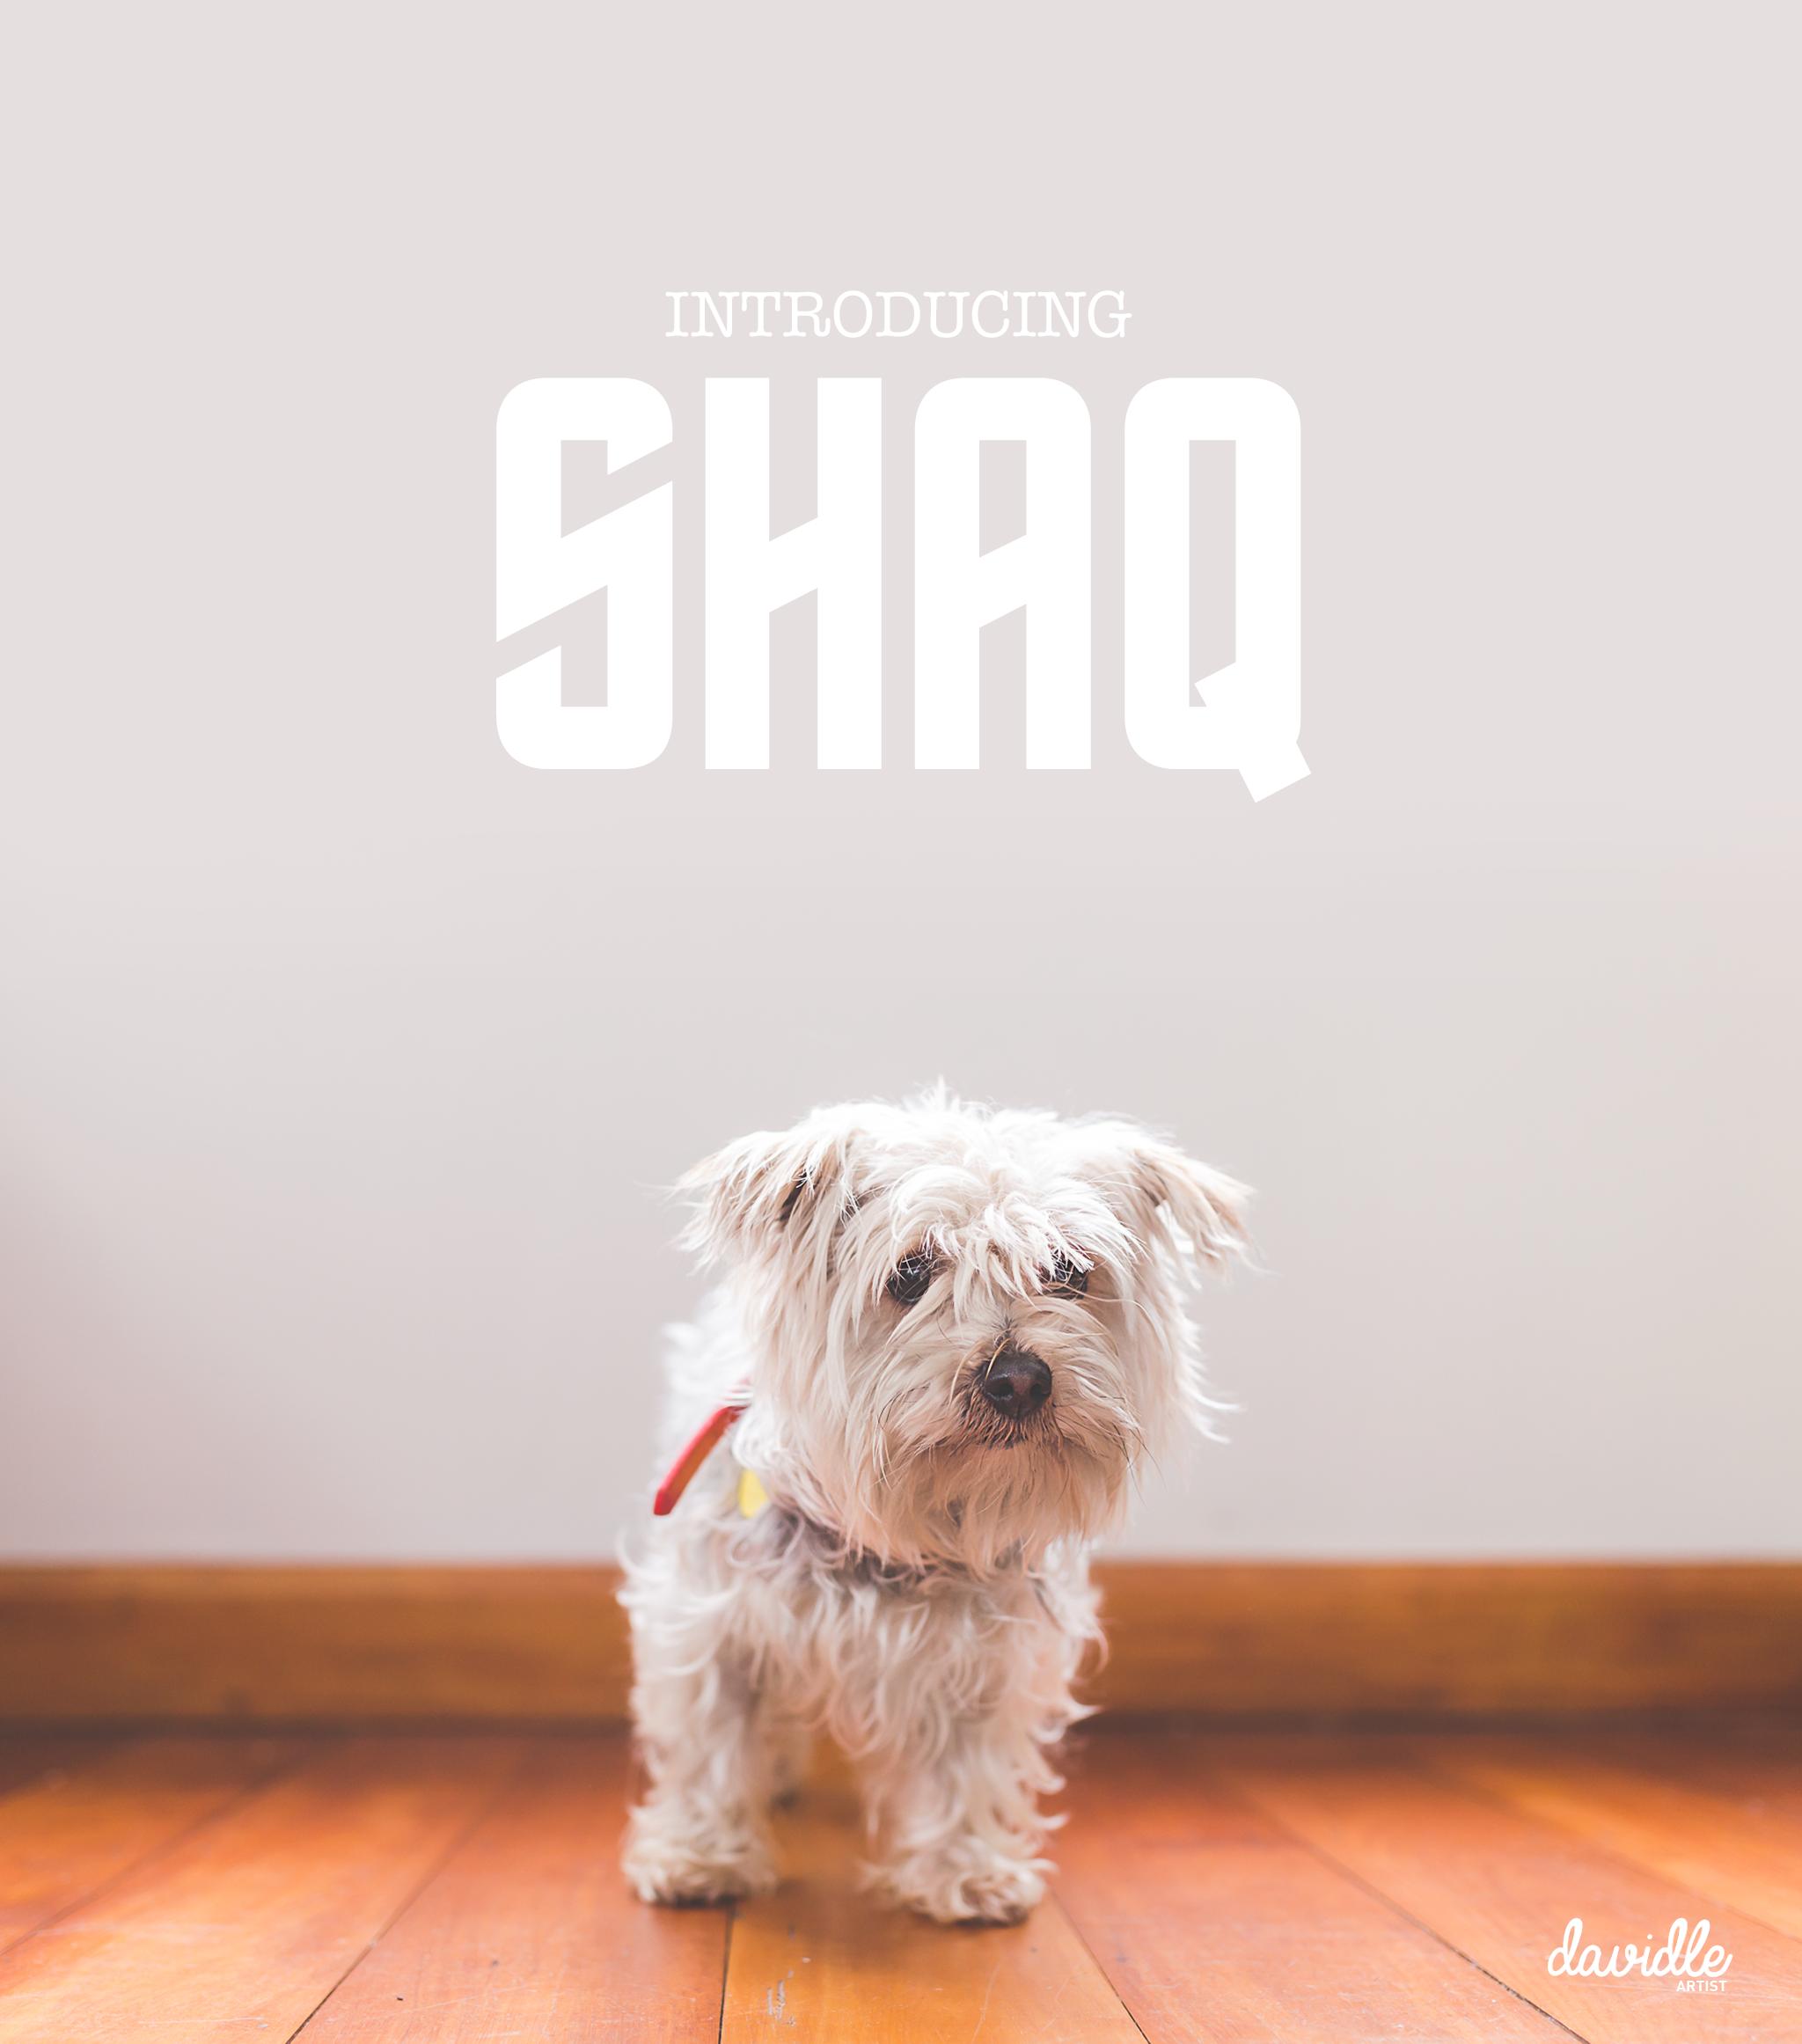 Meet the big guy, Shaq!